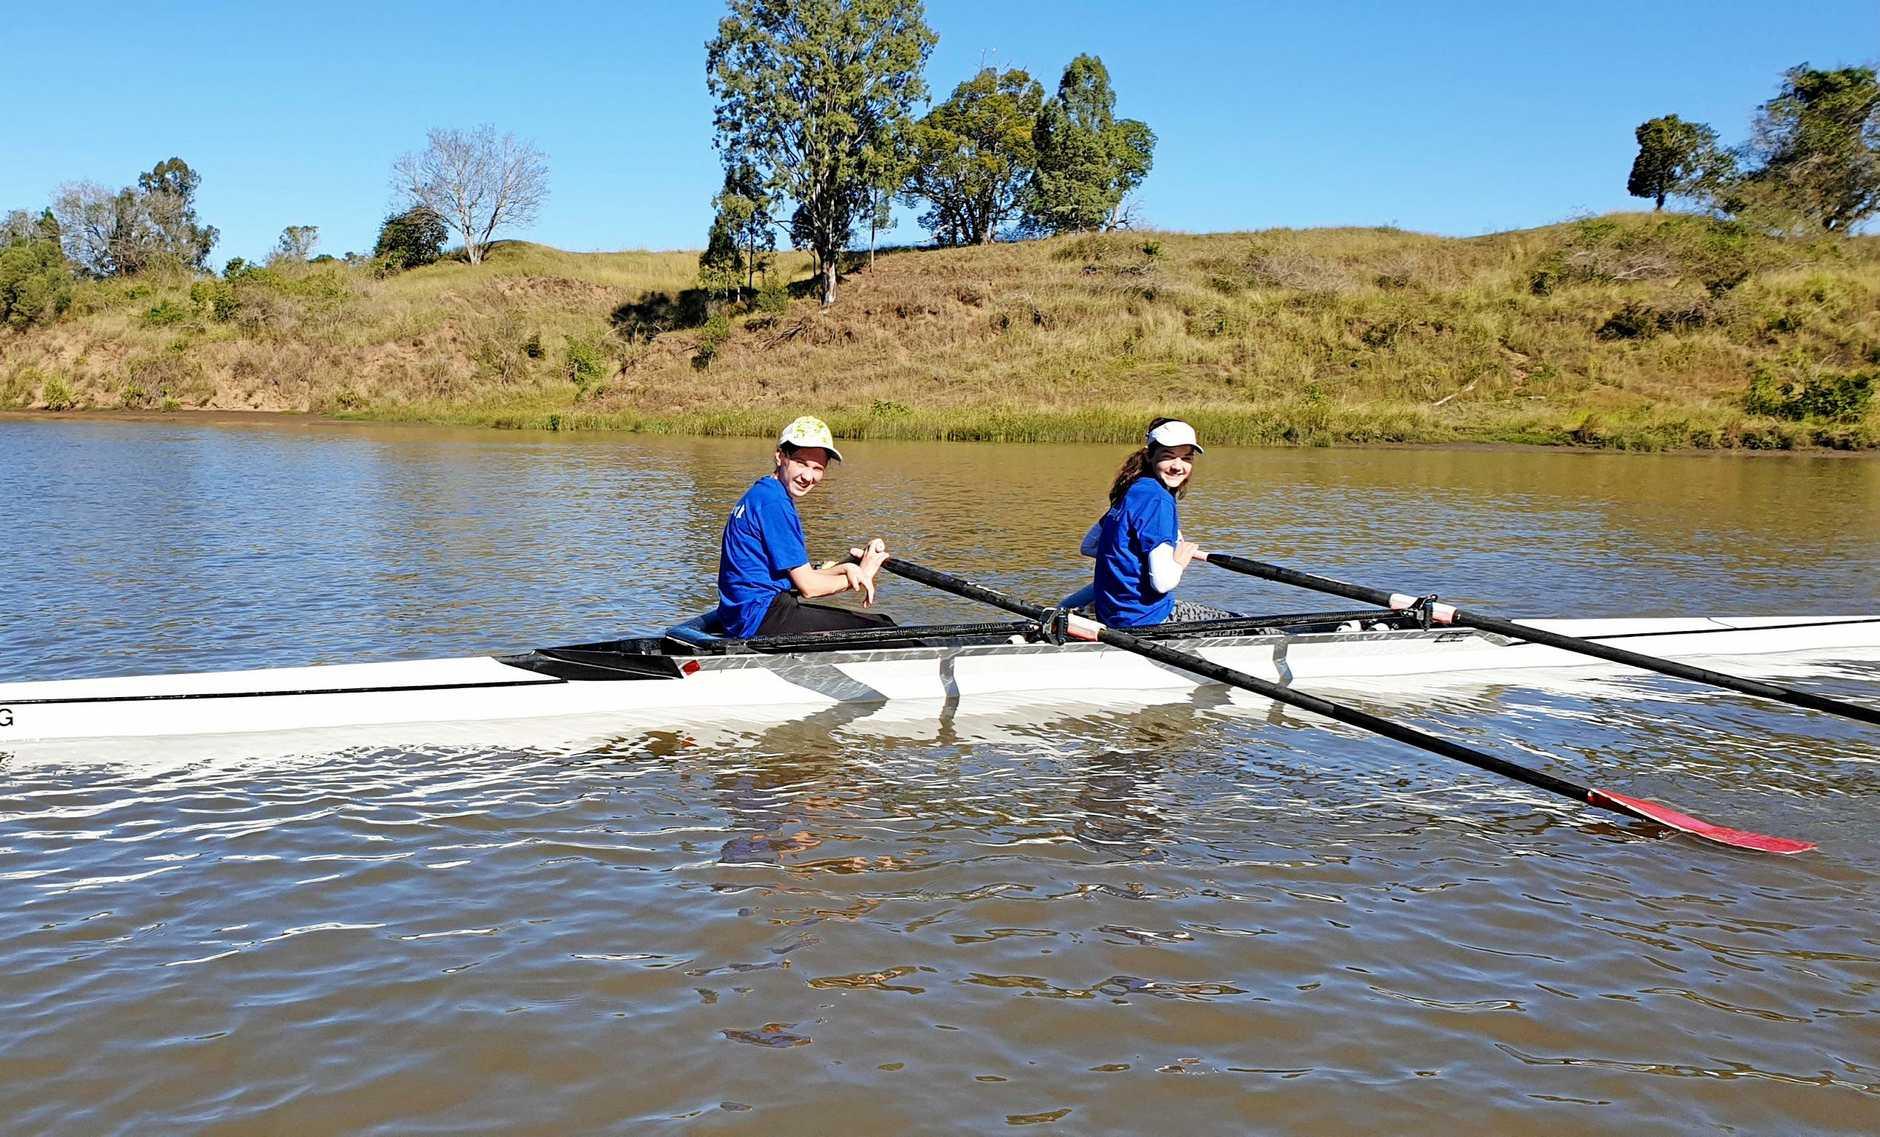 ENTHUSIASTIC: Members of the Lower Clarence Rowing Club in Brisbane last weekend.